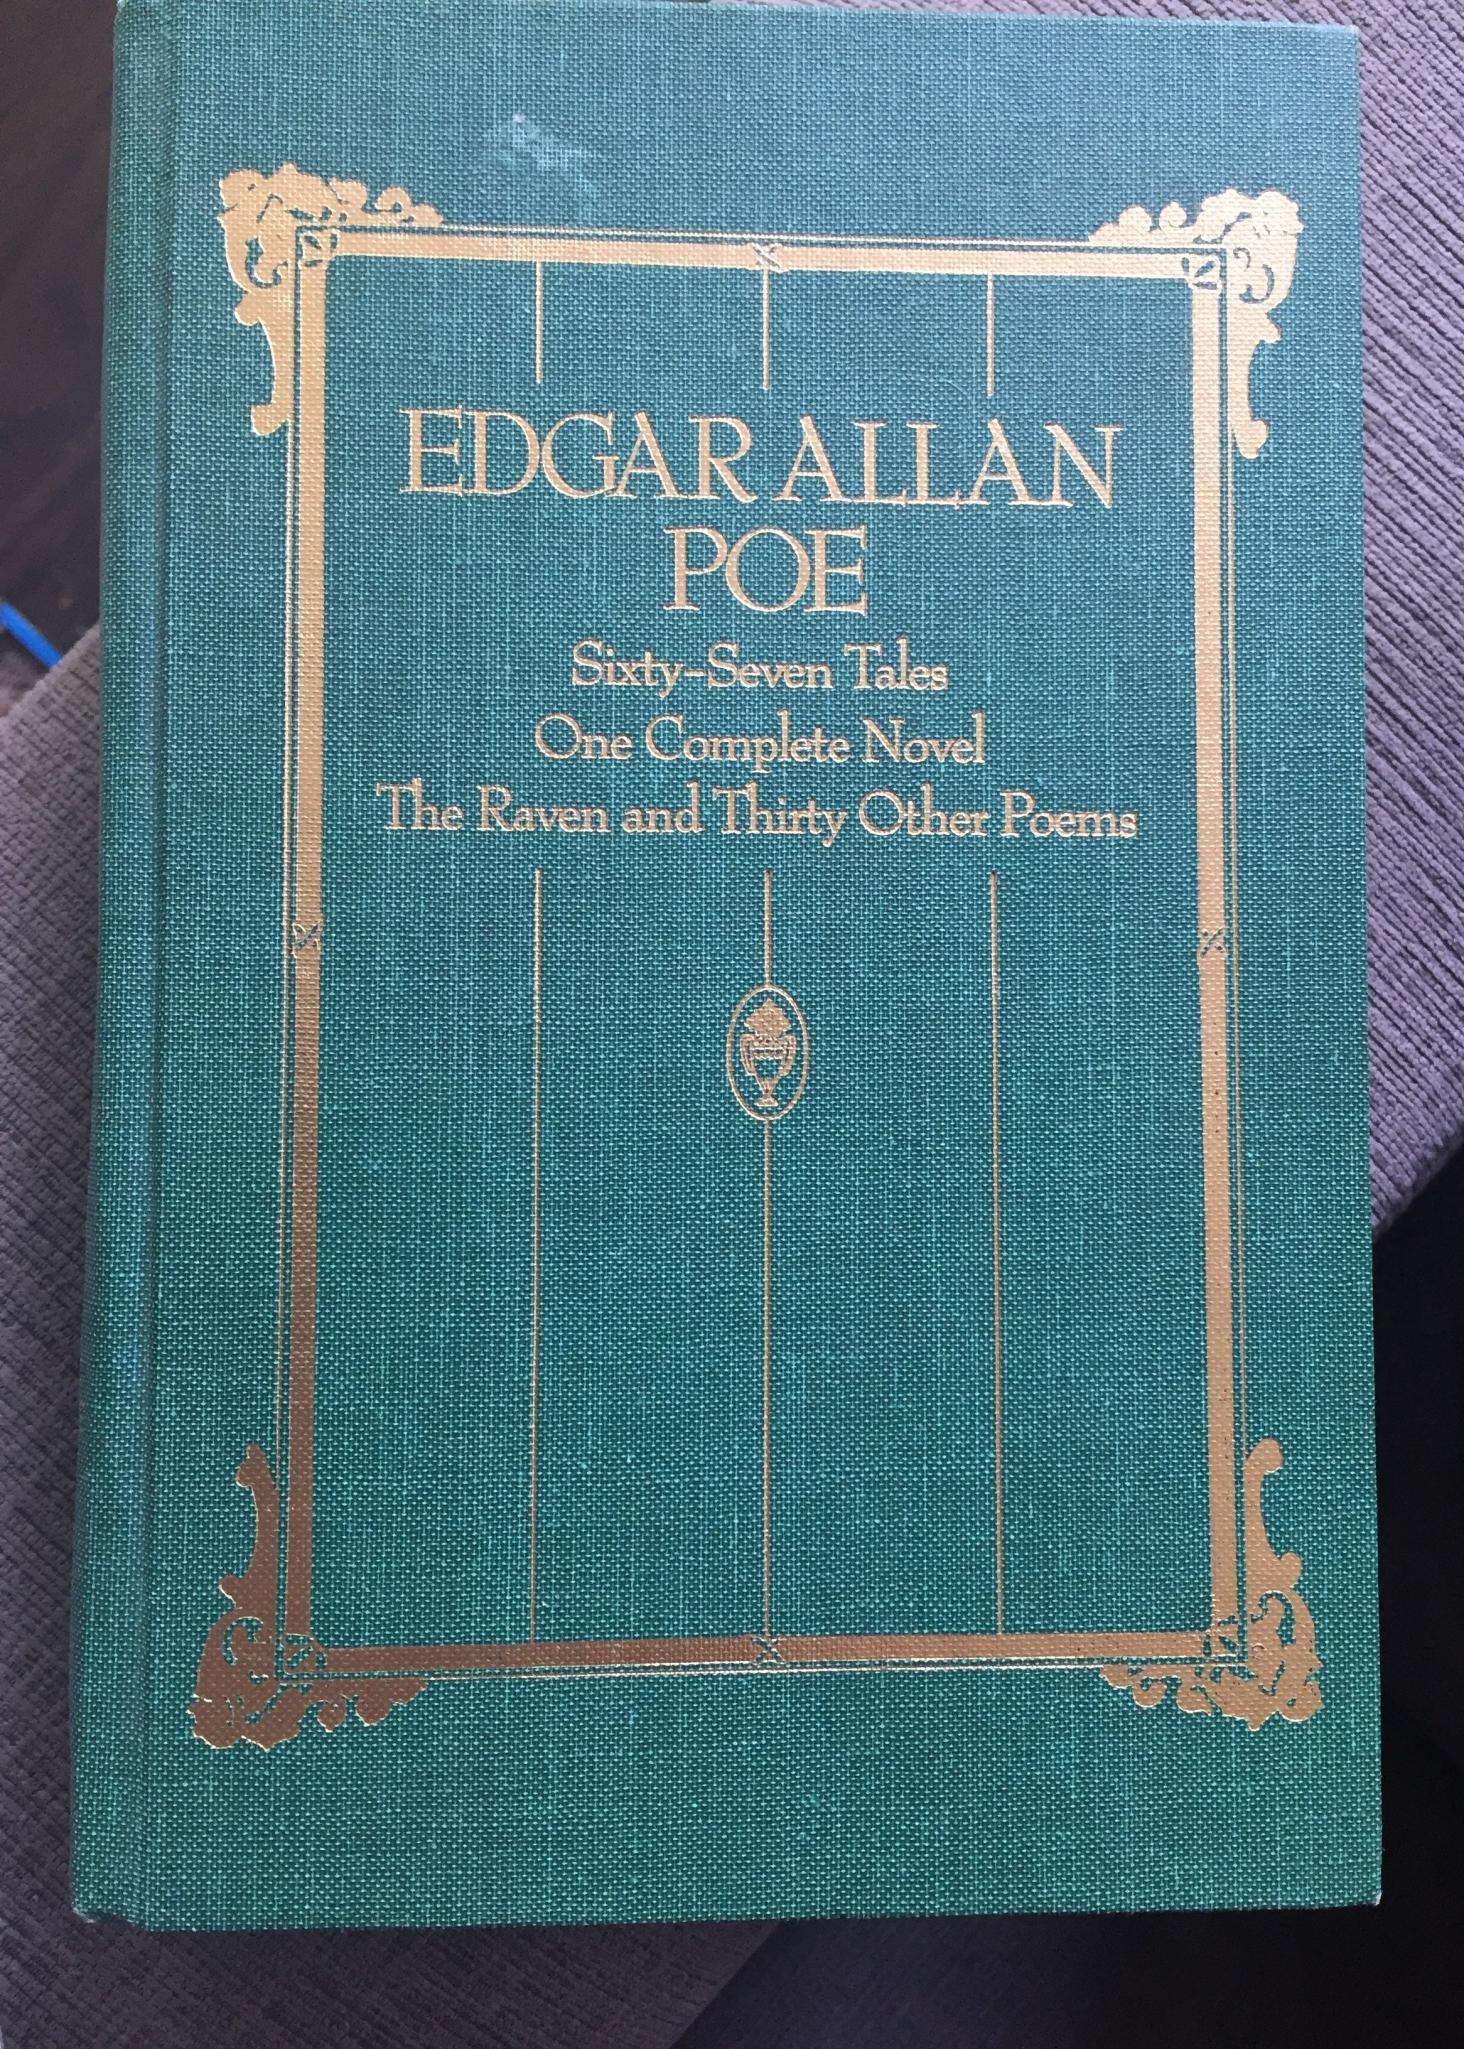 Edgar Allan Poe meets Aspasia S. Bissas